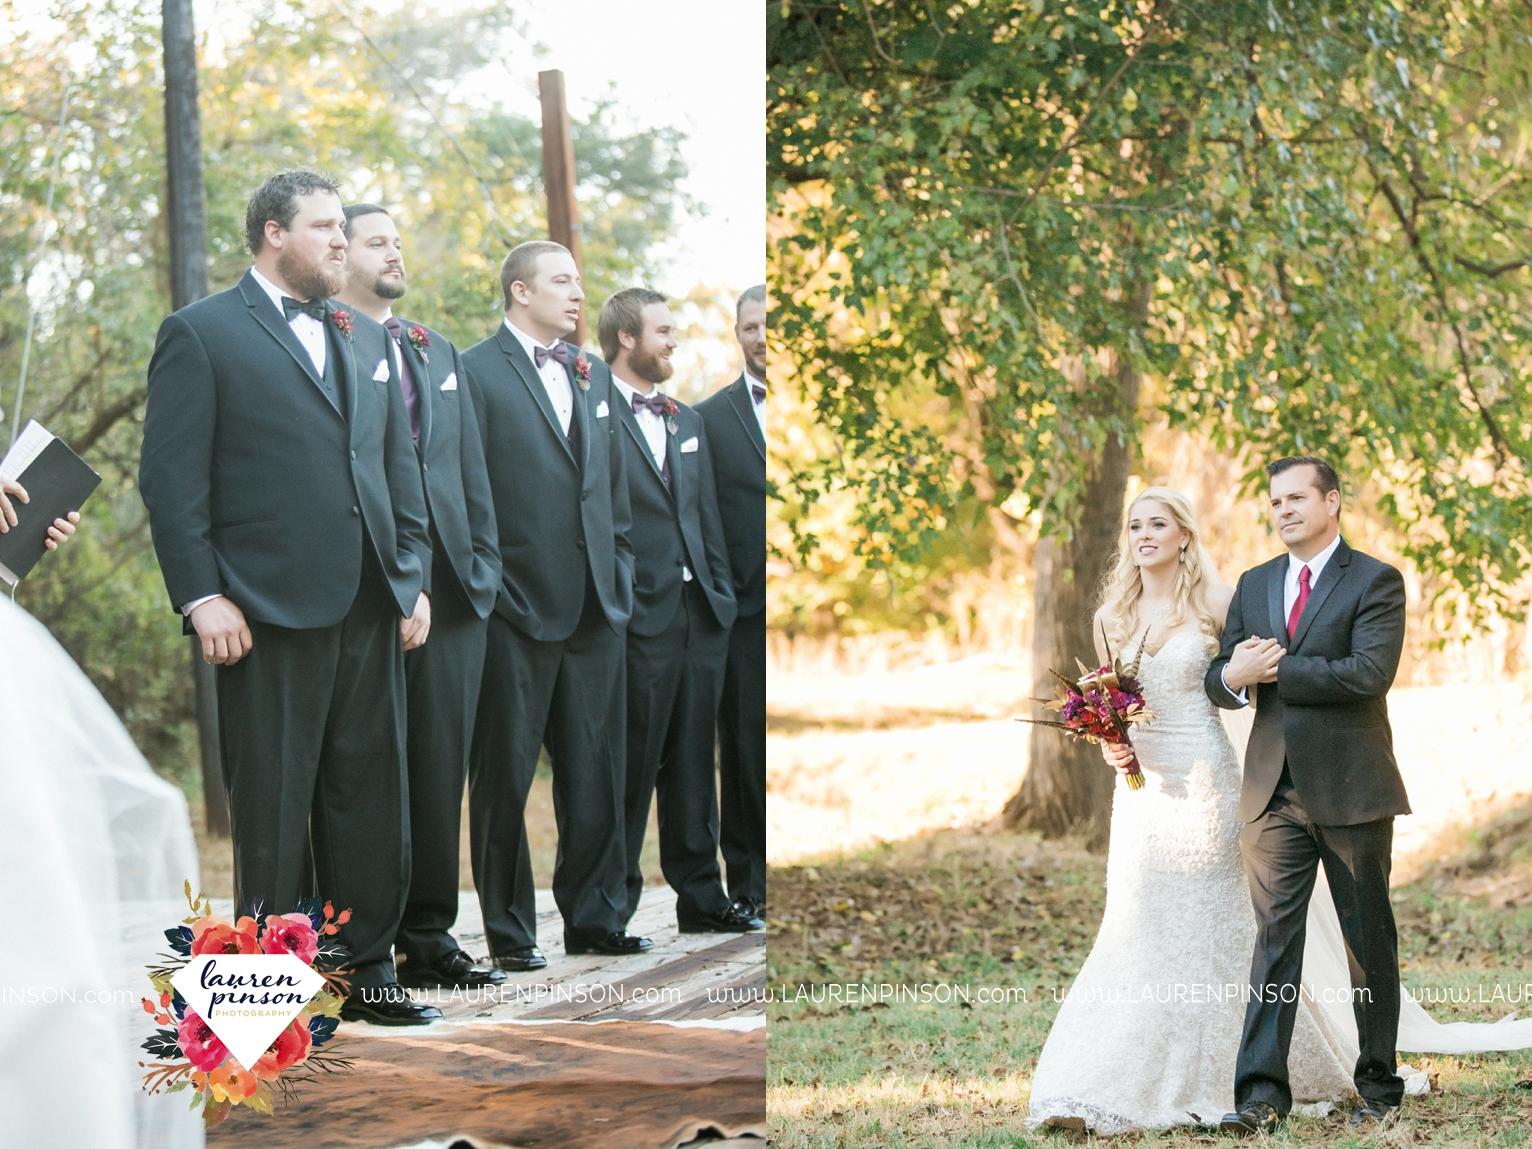 rustic-wichita-falls-texas-wedding-photographer-gold-glam-mayfield-events-market-street-united-allue-bridals-fall_1677.jpg